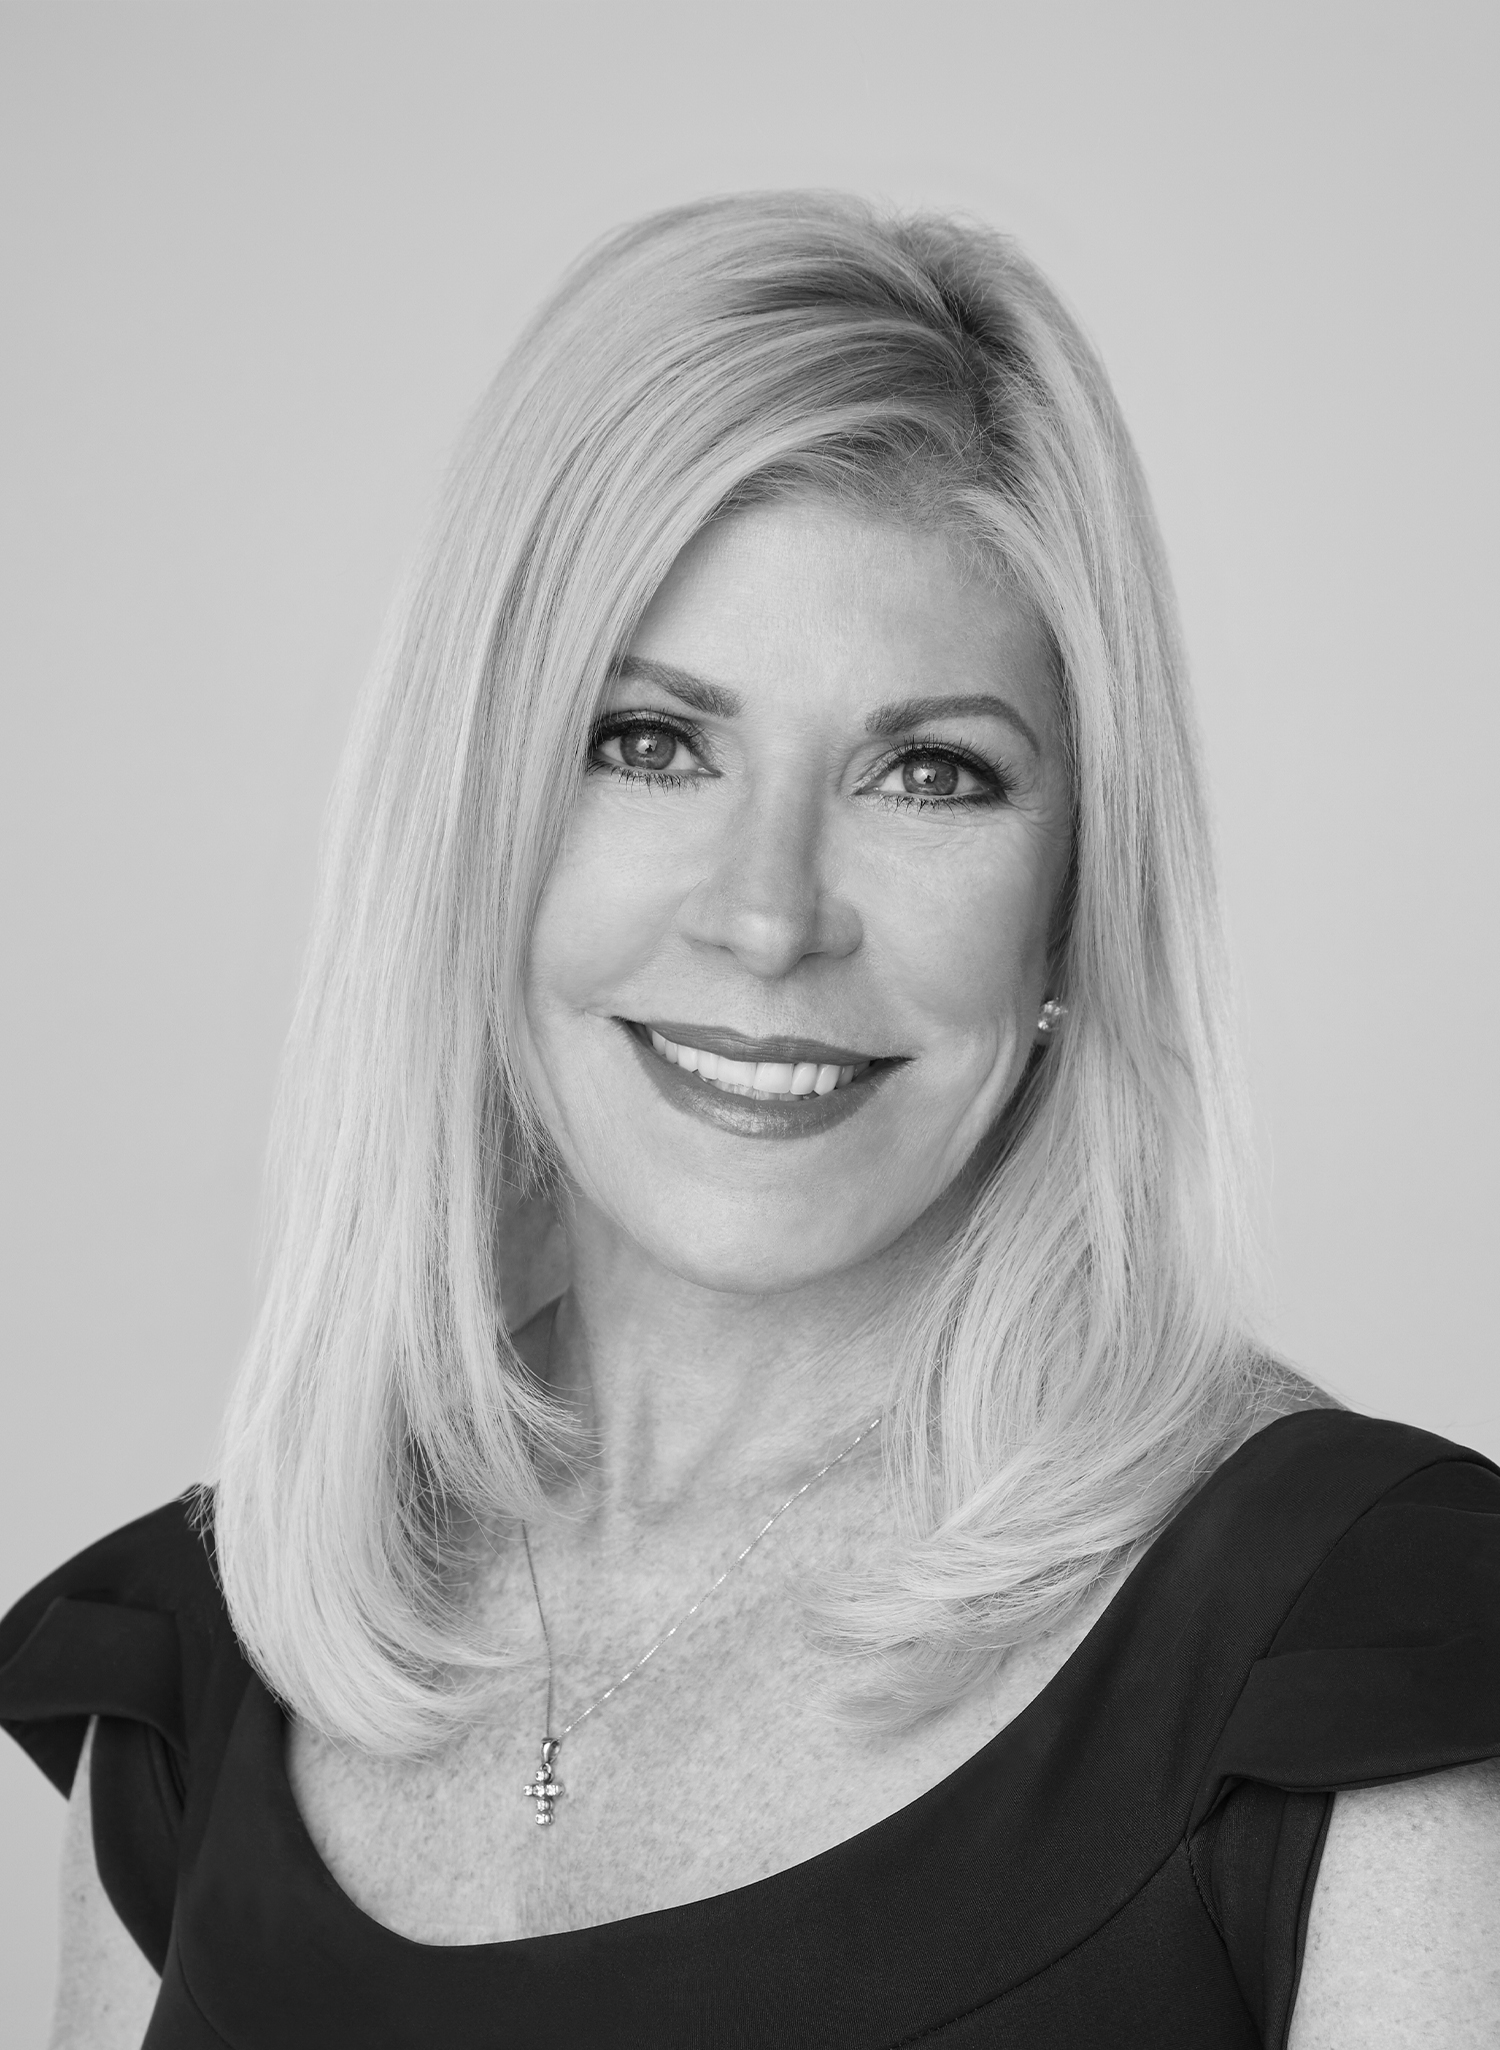 Sandra Tagliamonte